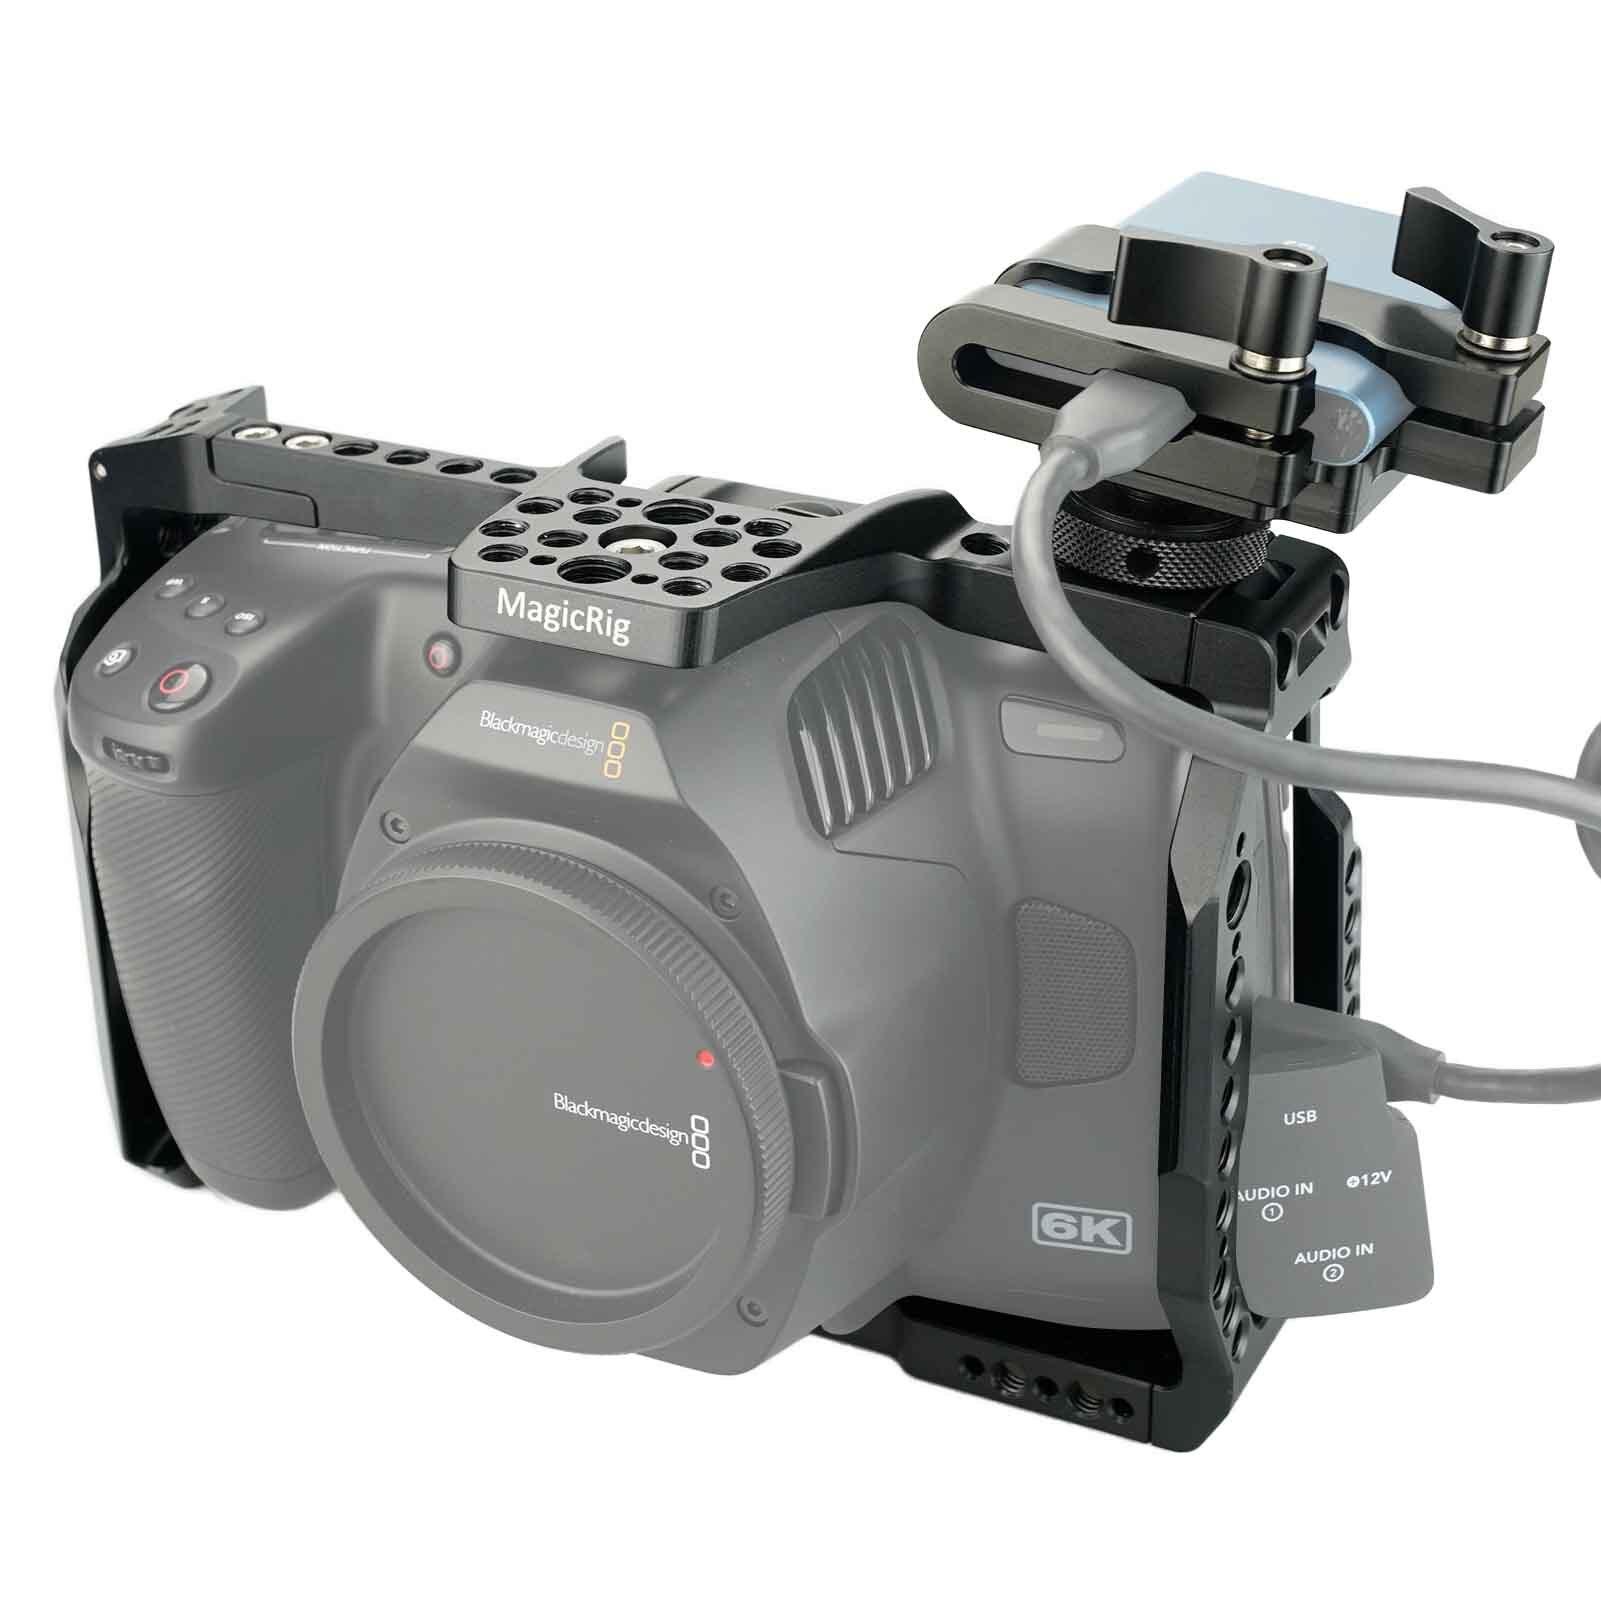 MAGICRIG BMPCC 6K Pro Cage With T5 SSD Mount for Blackmagic Design Pocket Cinema Camera 6K Pro enlarge